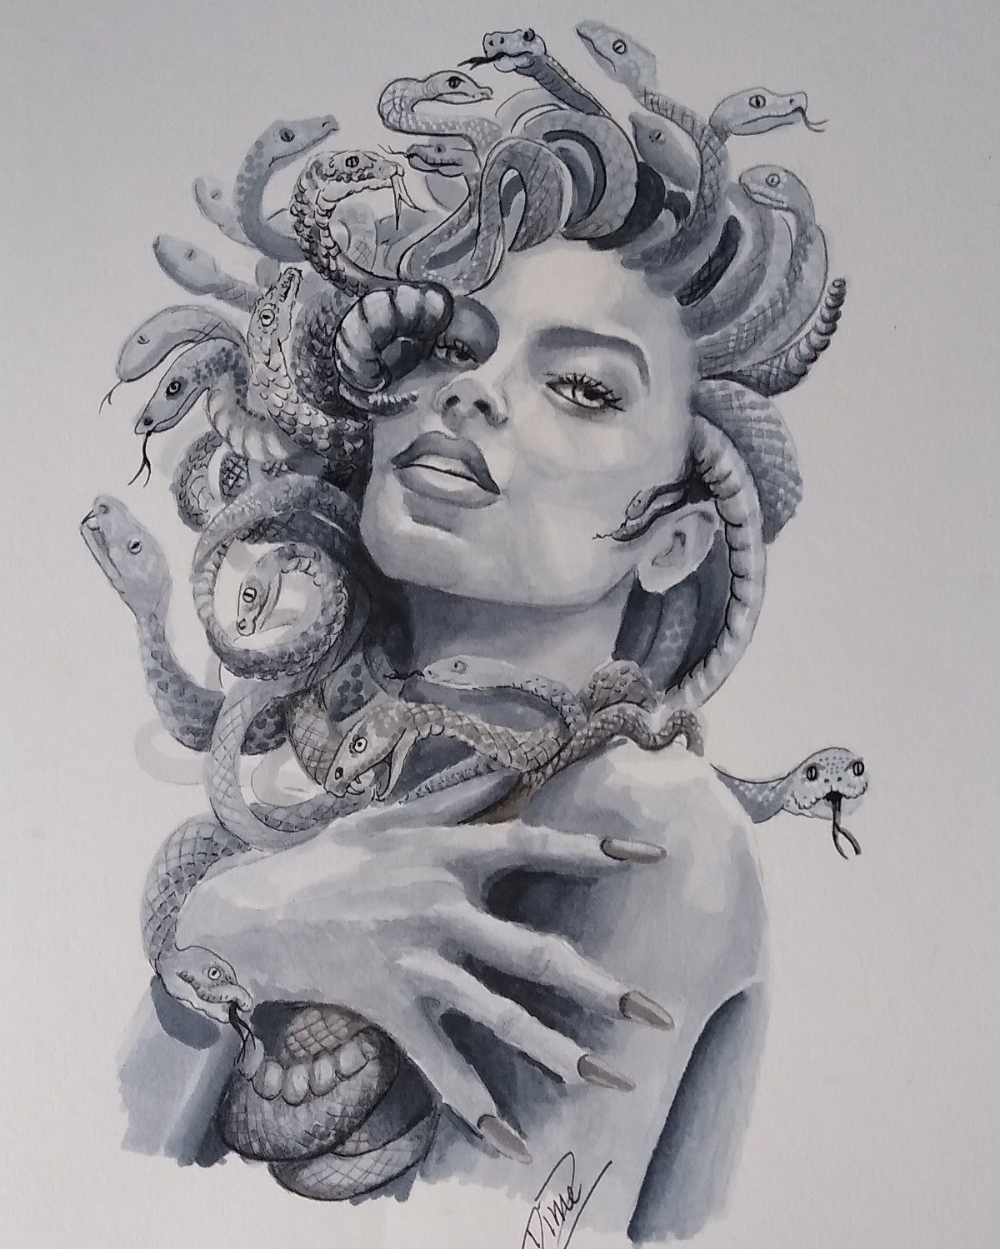 Drawing Exercises For Tattoo Artists : drawing, exercises, tattoo, artists, Medusa,, Copic, Markers, Medusa, Oefeningen, Dinie, Zeeuw, Diniez, Fantasy, Artists…, Tattoo, Design,, Tattoo,, Tattoos